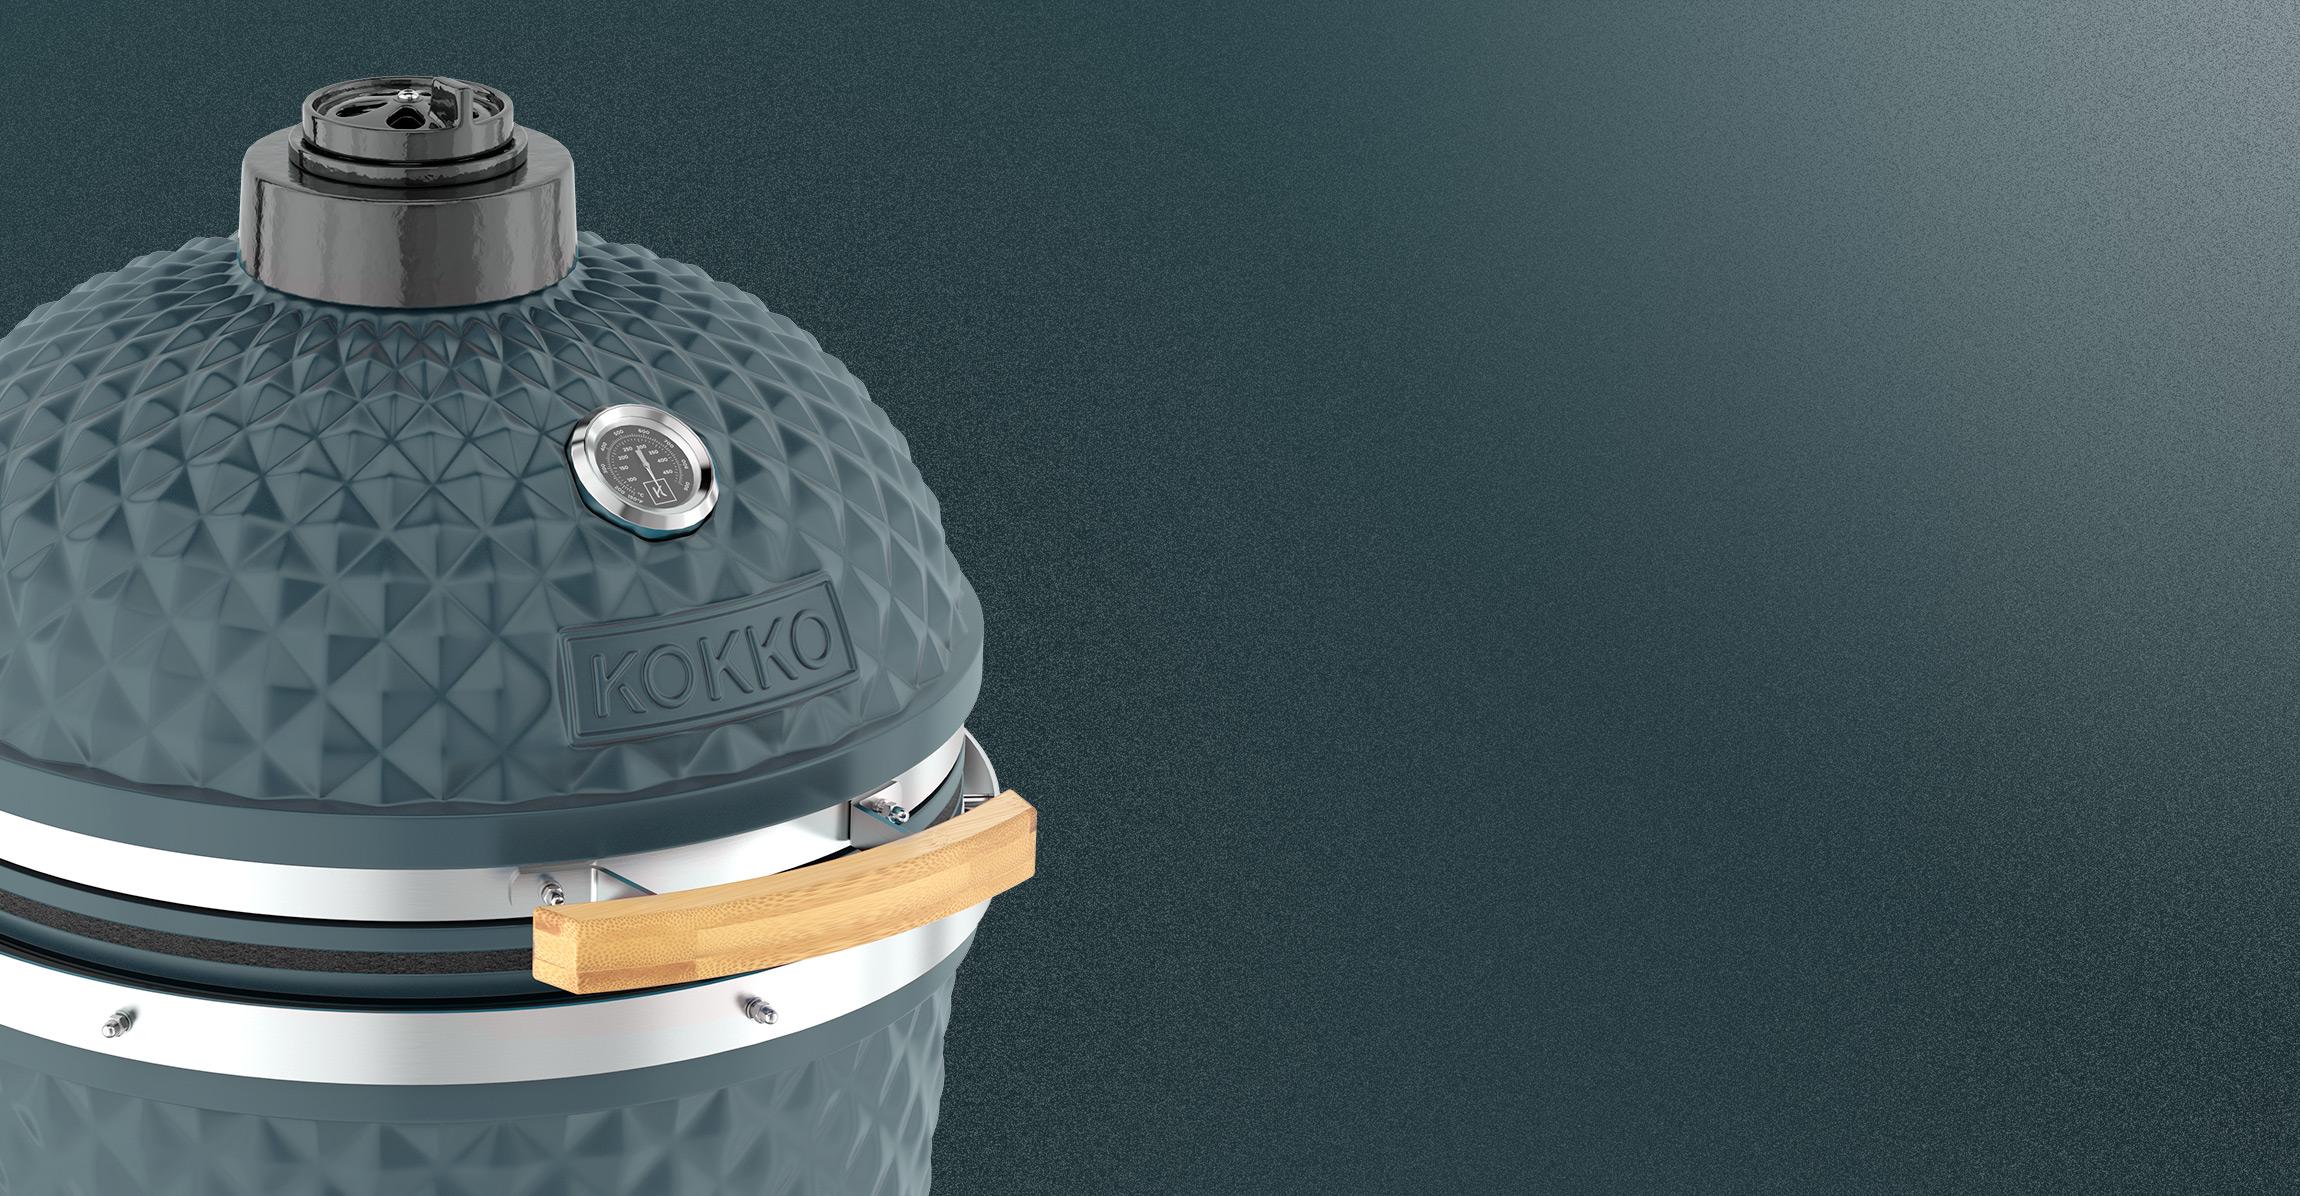 Kokko barbecue ceramique bleu